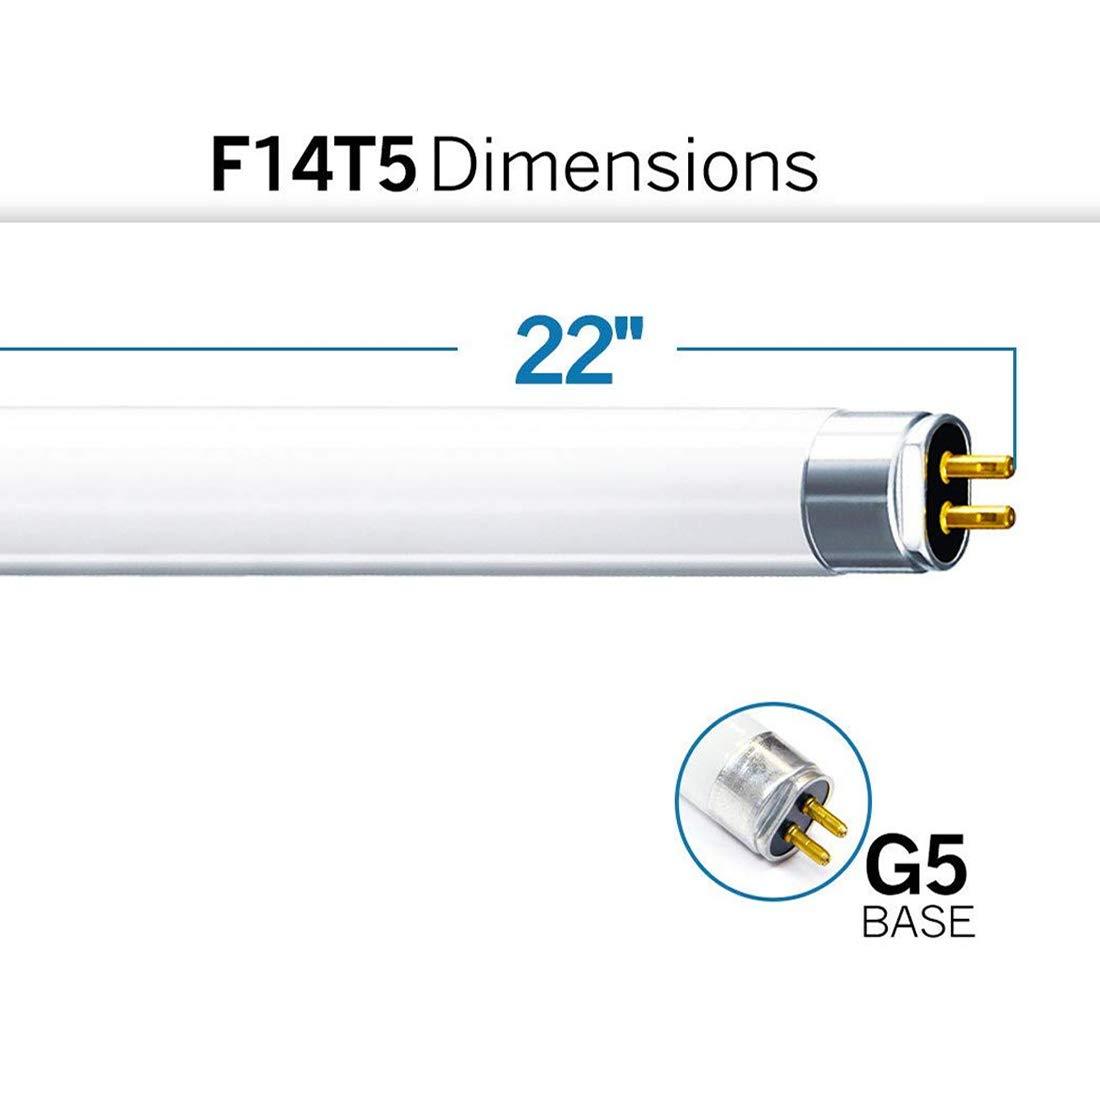 Osram 14w T5 High Efficiency 840 Cool White Fluorescent 549mm Tube 4000k HE 12 Pack FH1840